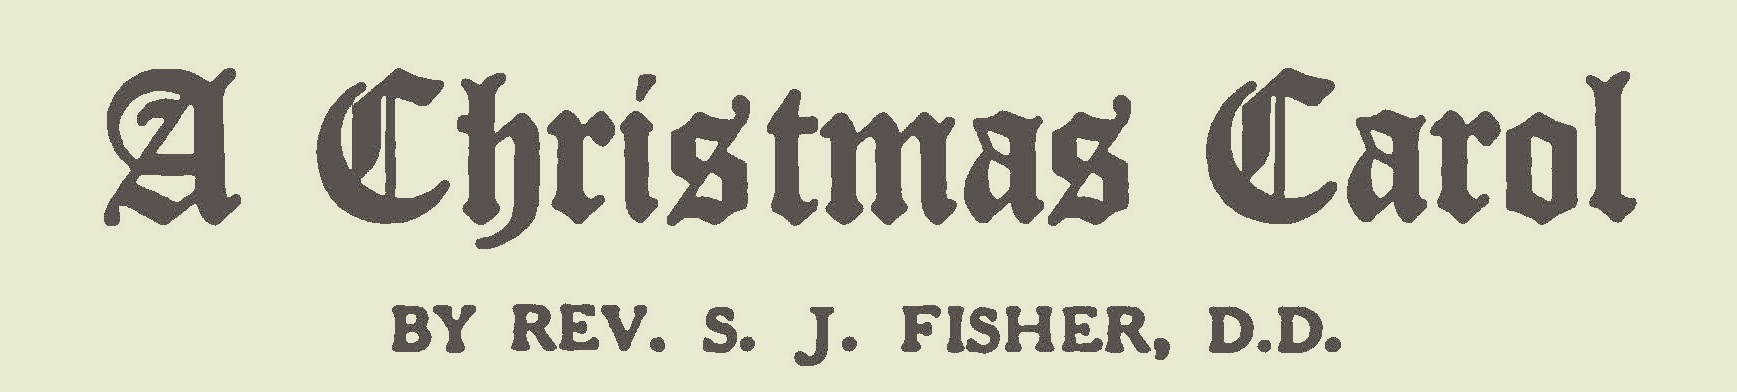 Fisher, Samuel Jackson, A Christmas Carol Title Page.jpg